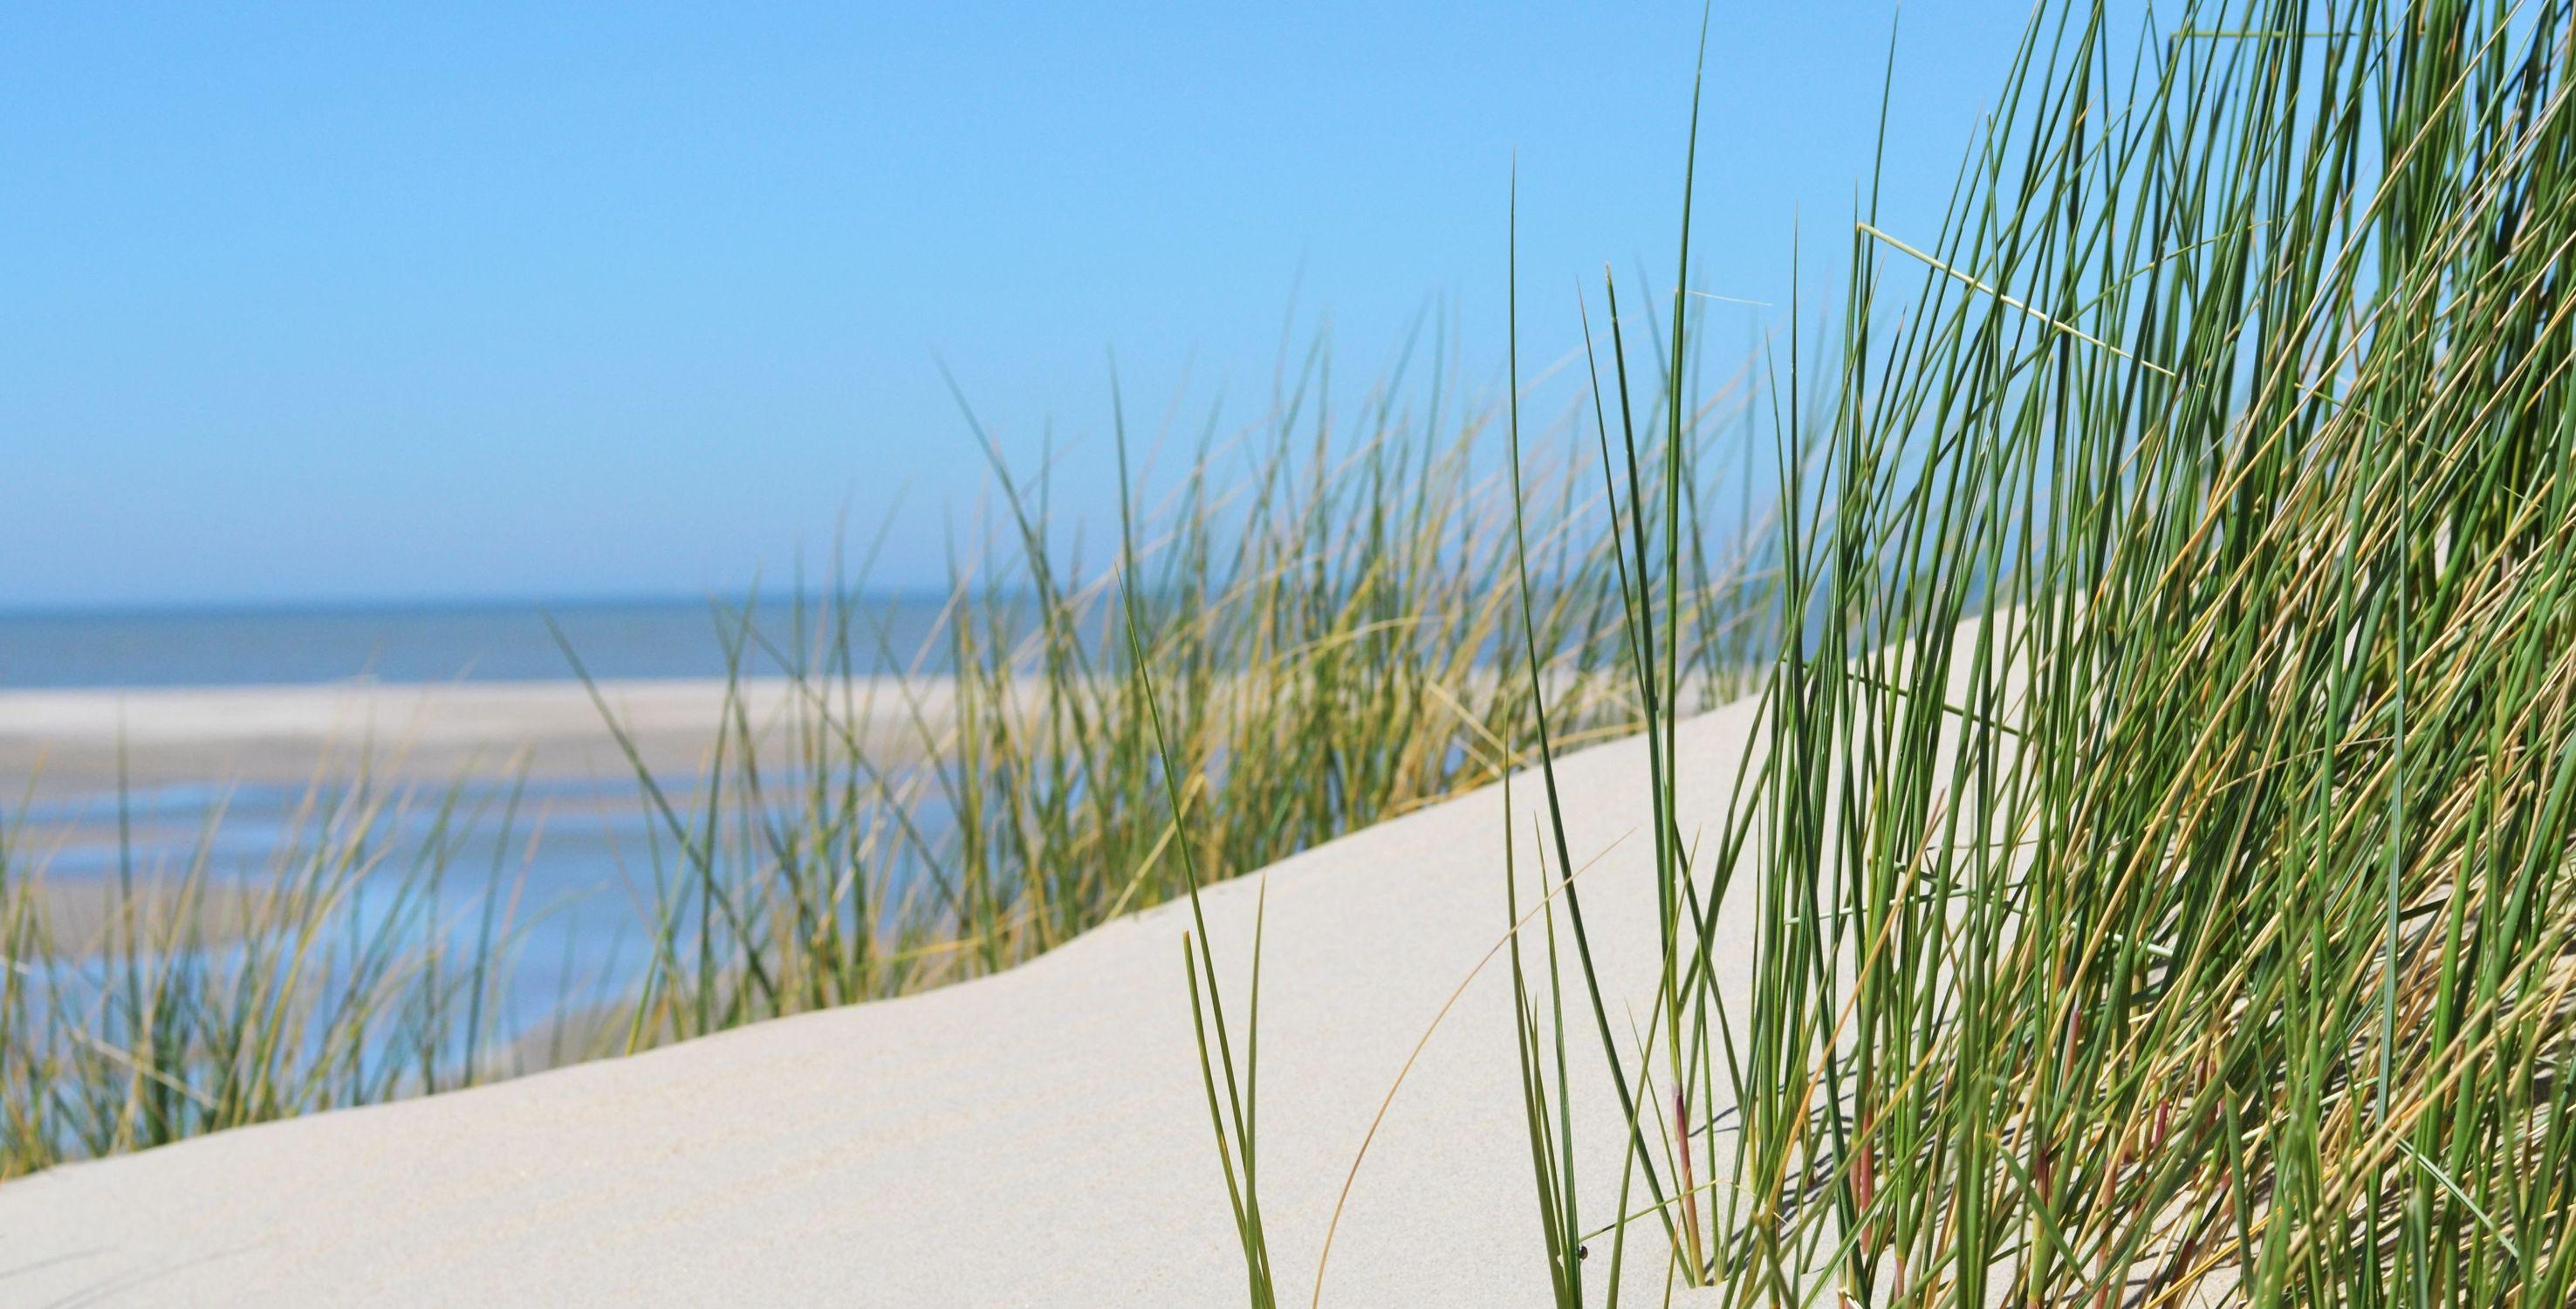 Bild mit Natur, Wasser, Landschaften, Seen, Strände, Strand, Sandstrand, Ostsee, Meer, Düne, Dünen, Dünengras, See, maritimes, Strandhafer